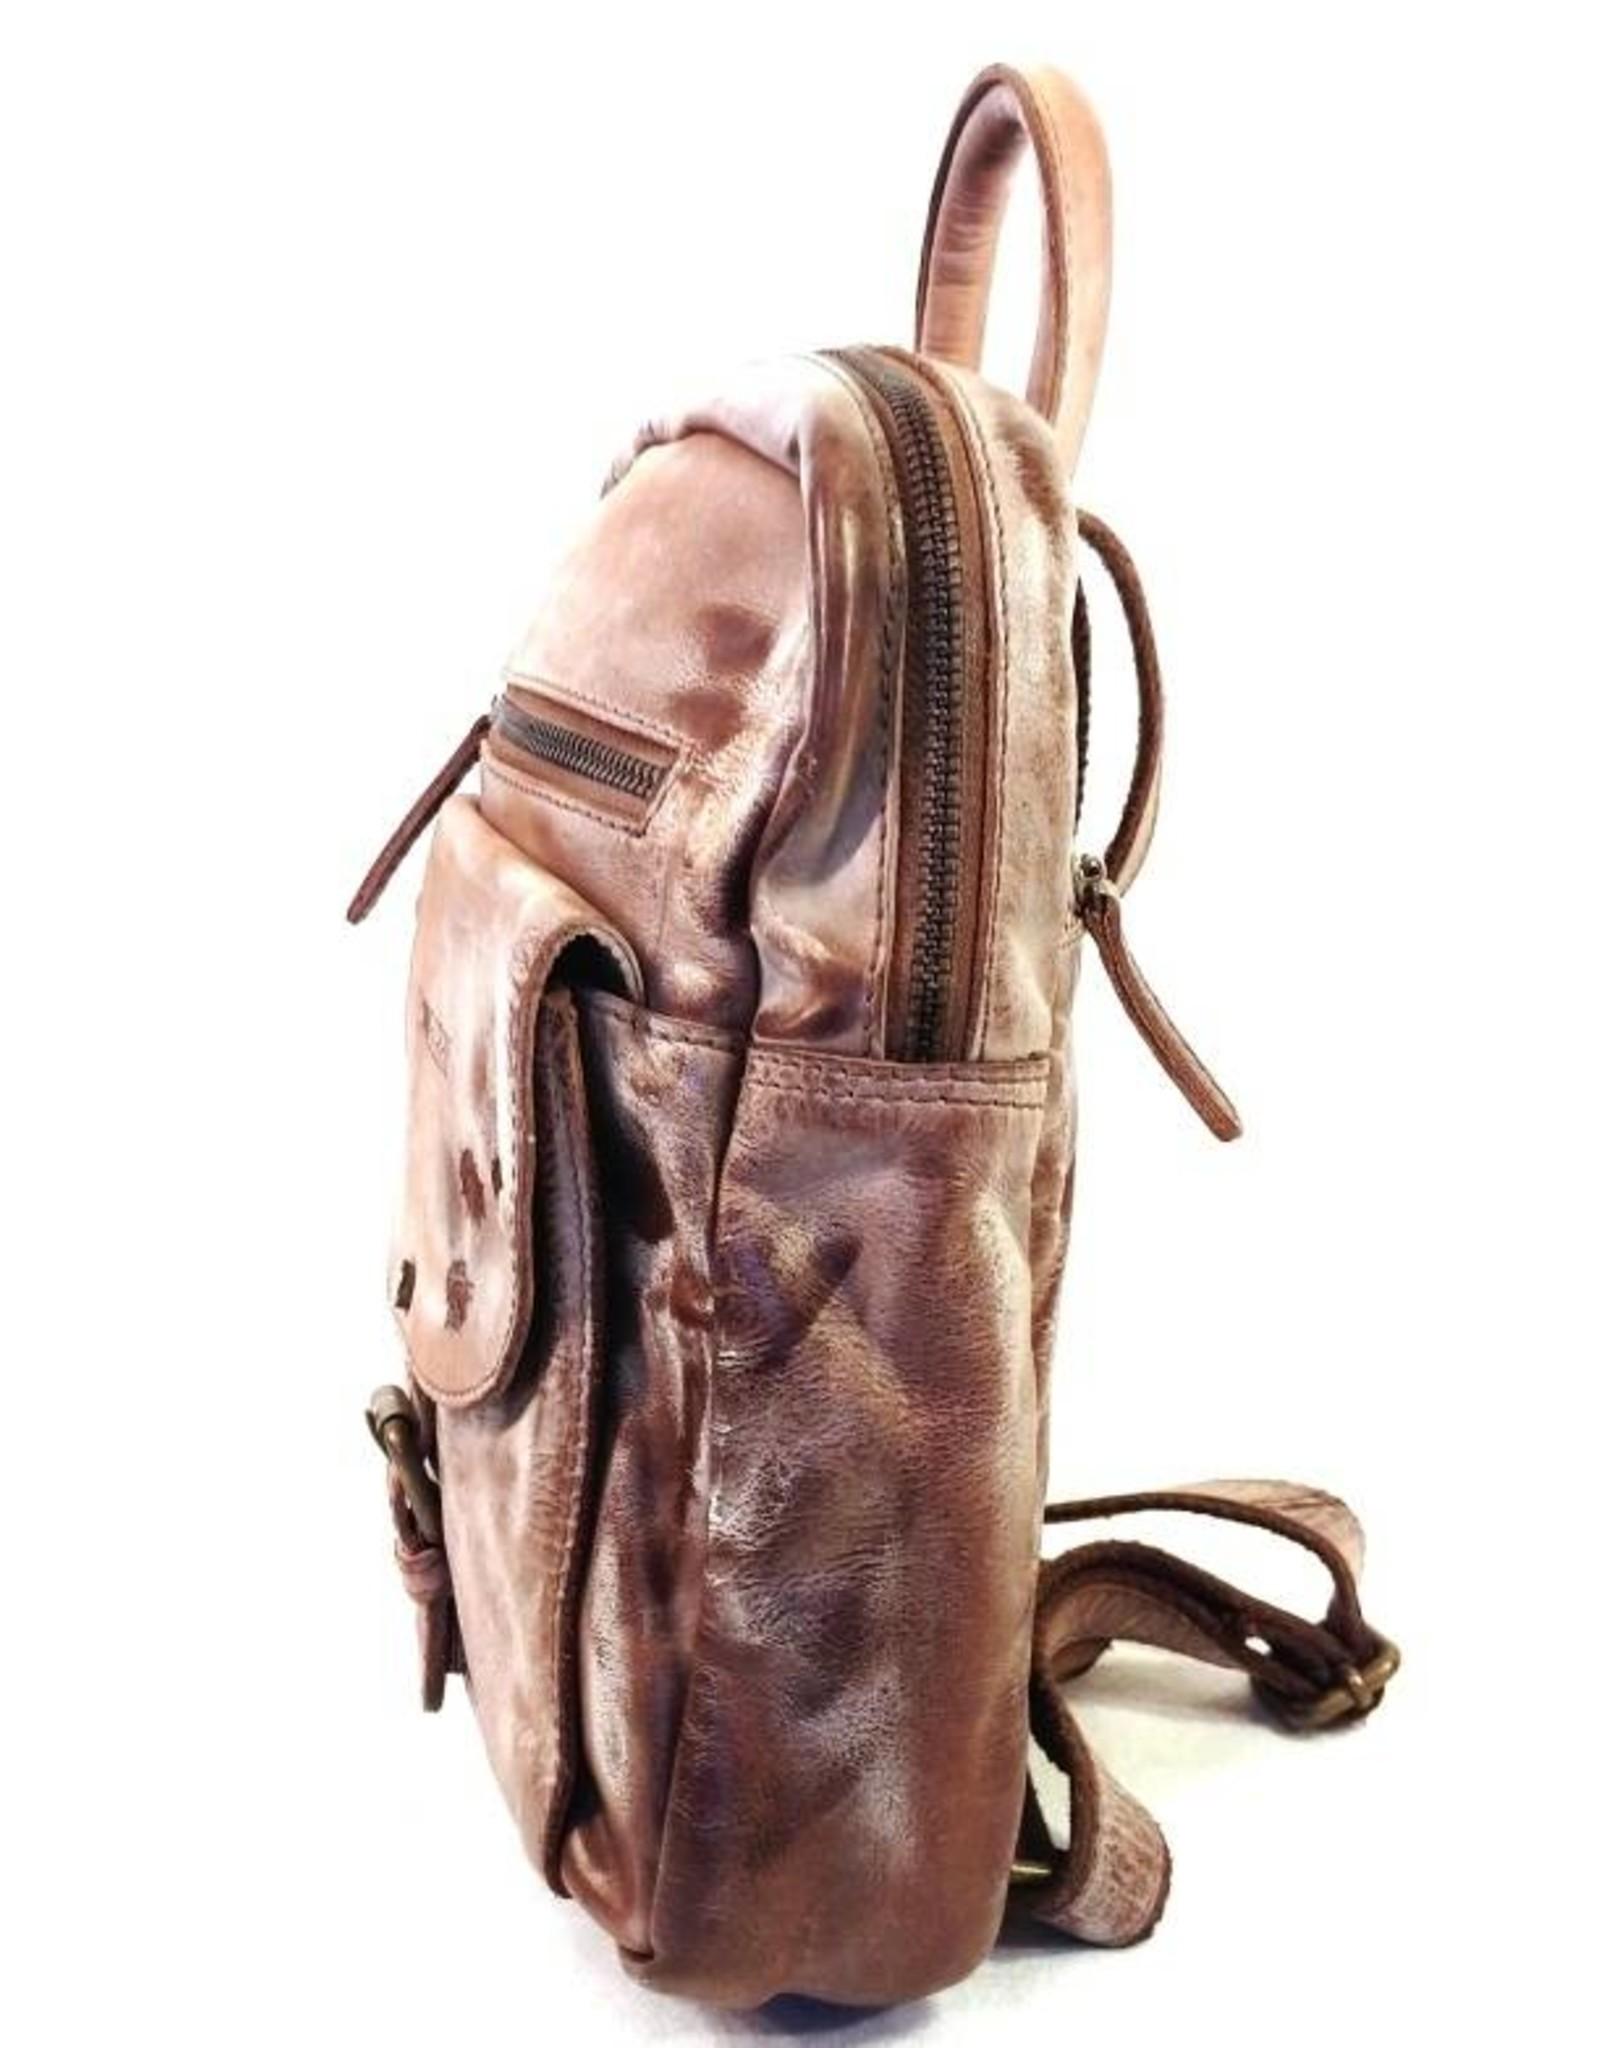 HillBurry Leren rugzakken - HillBurry leren rugzak van gewassen leer 2436